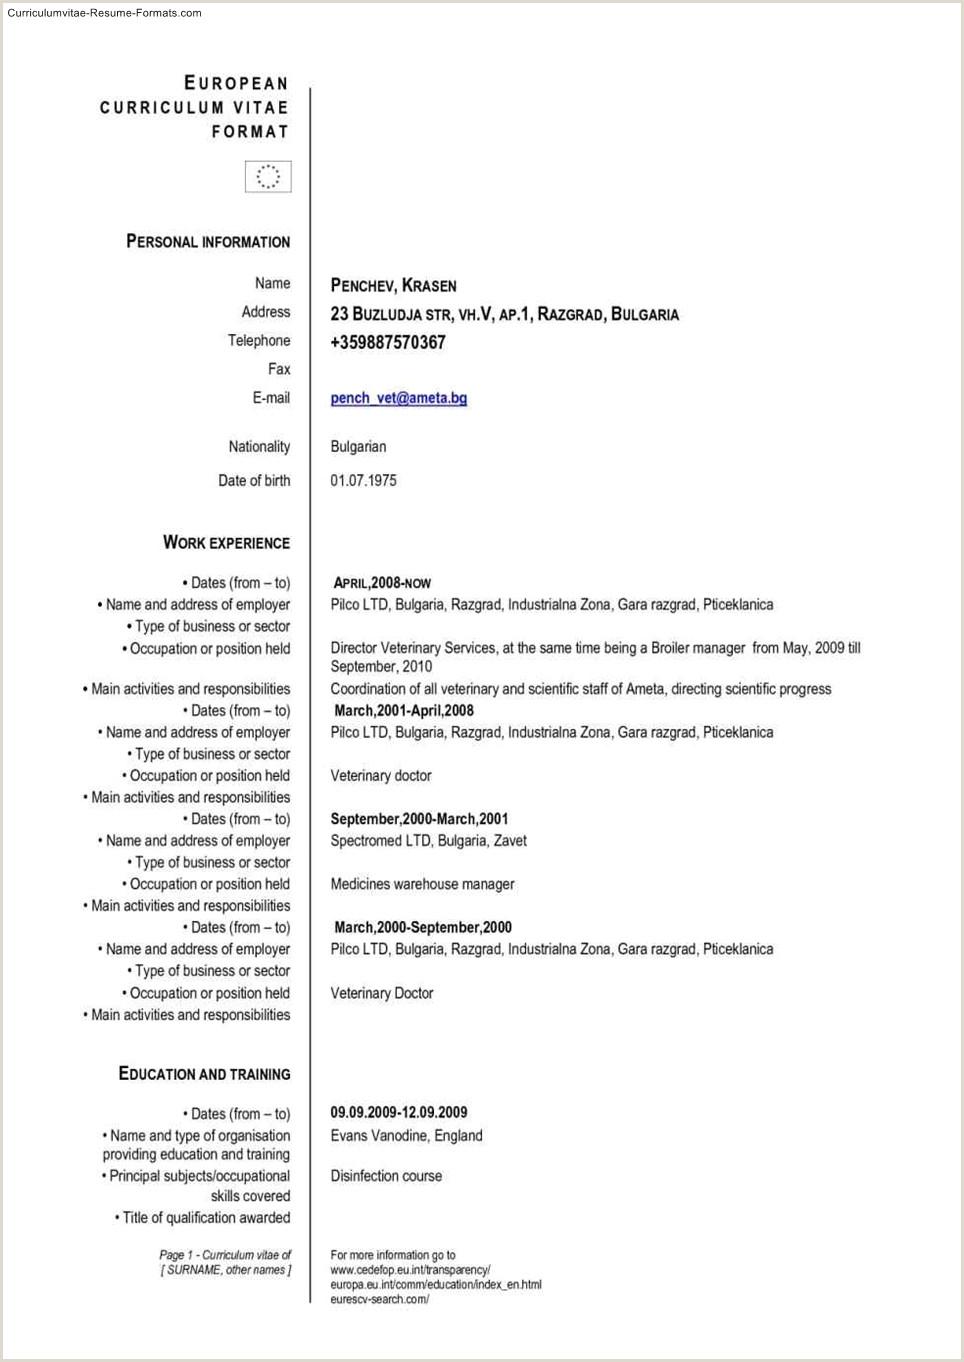 Europass Cv format Francais 25 European Cv format